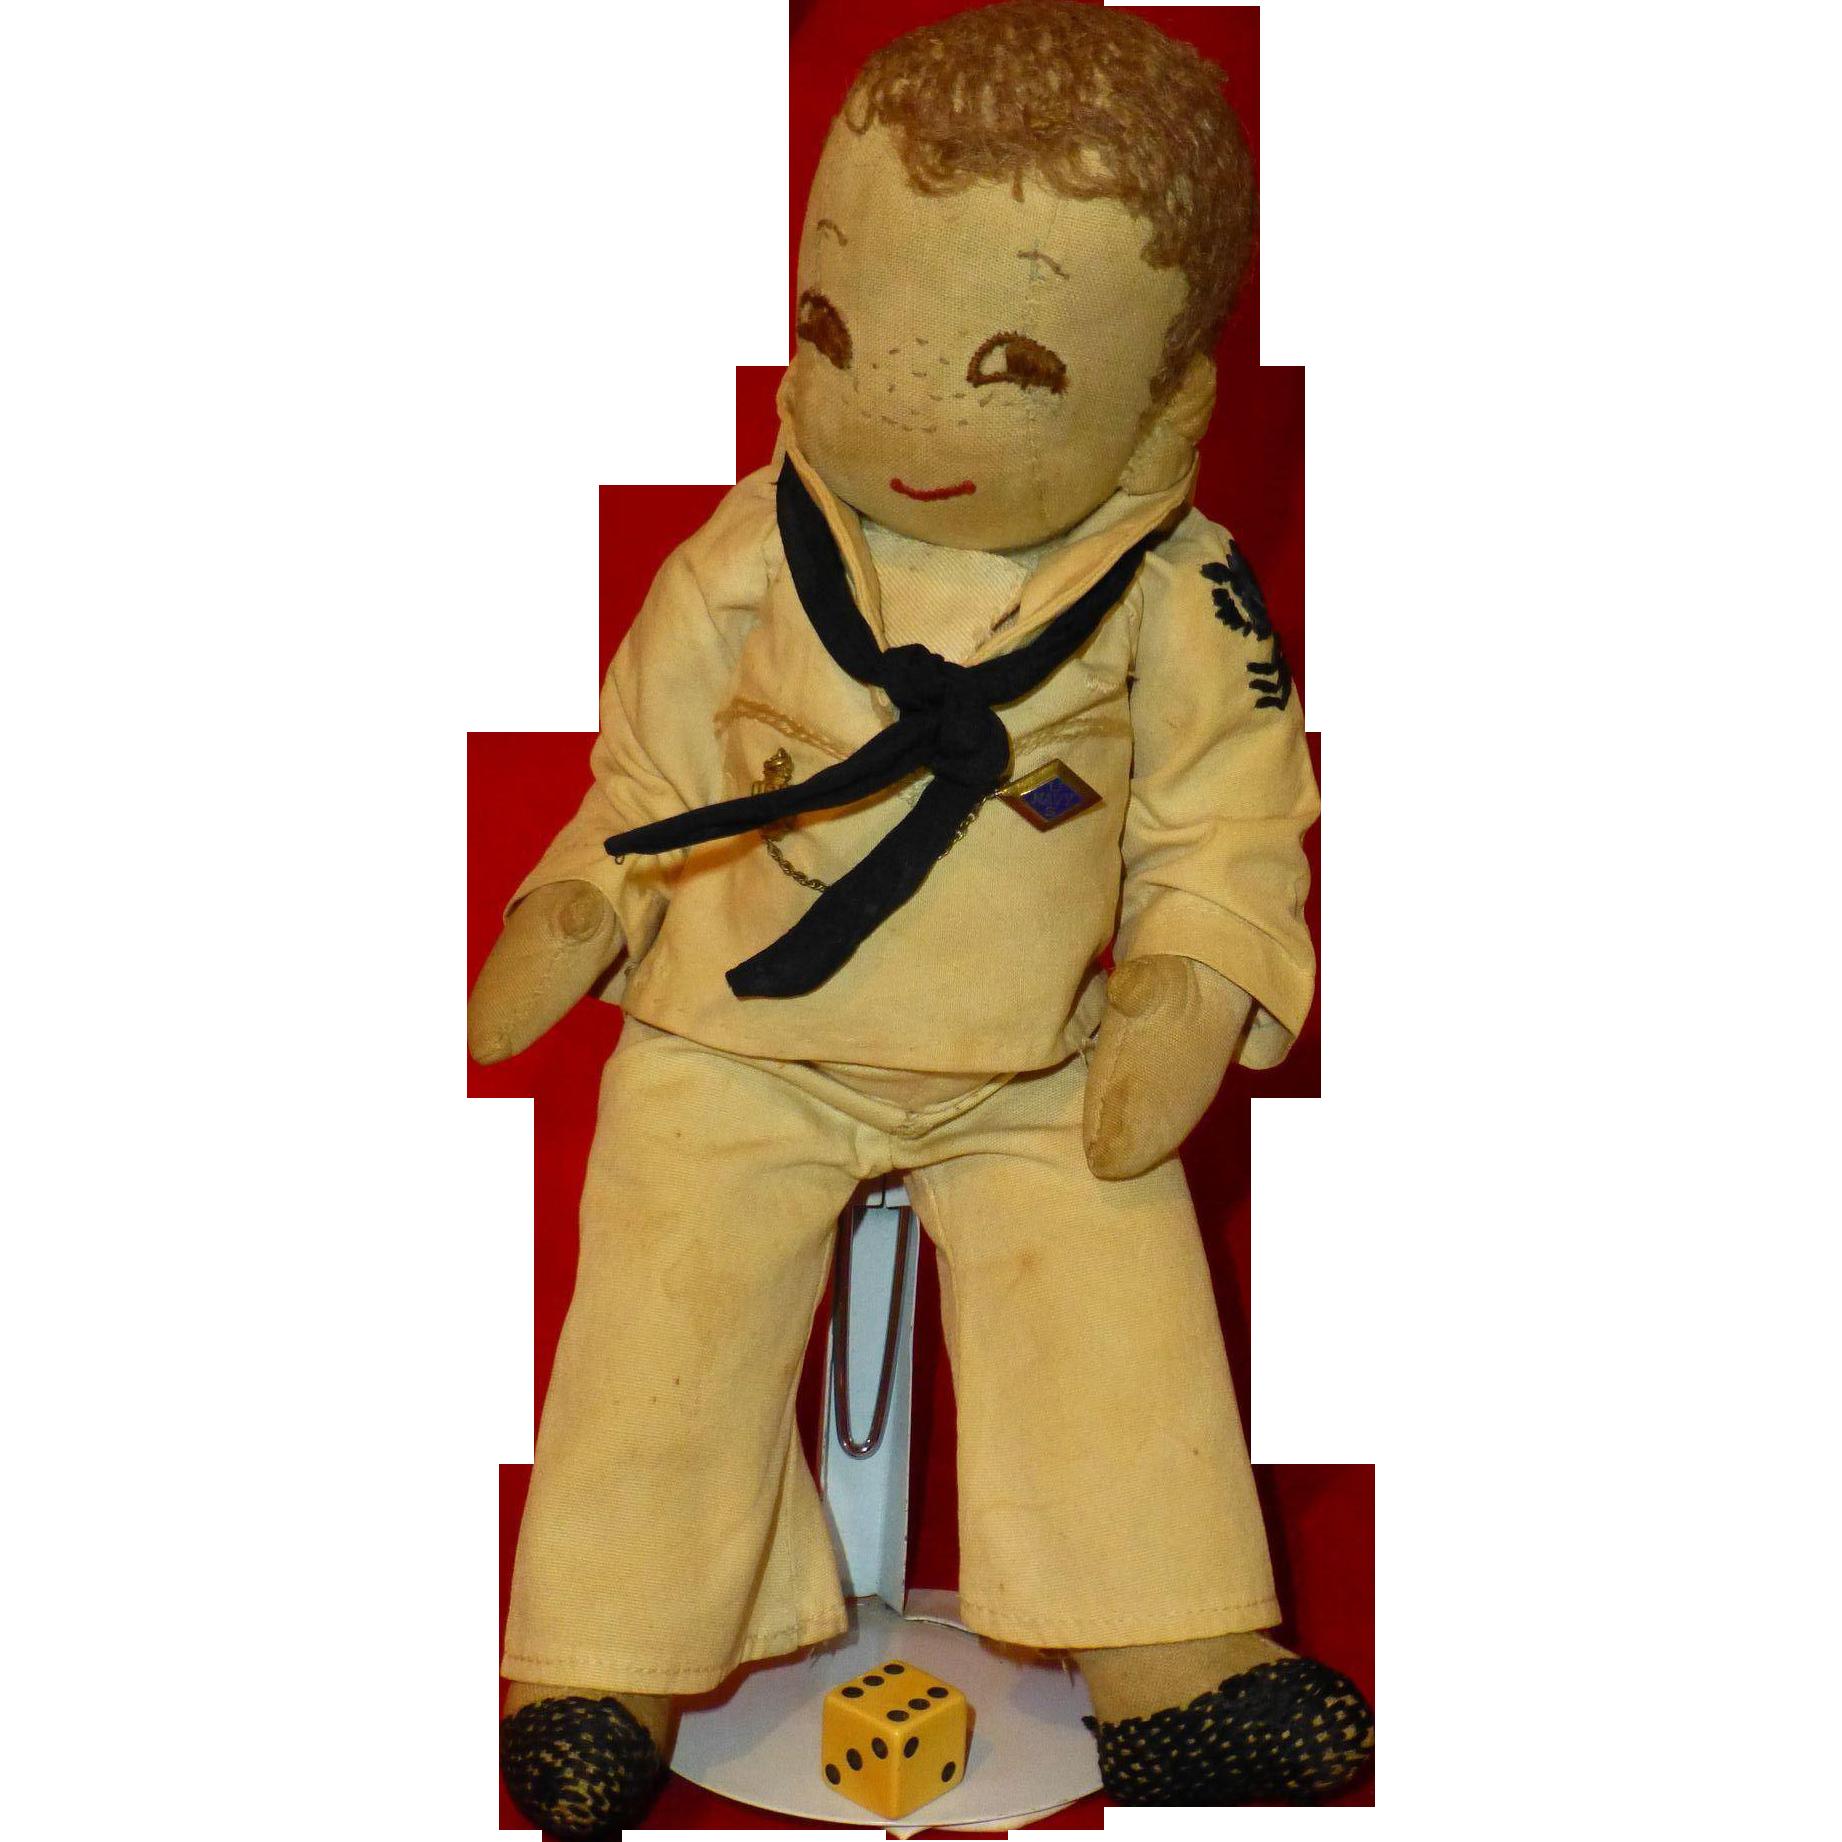 Antique Us Navy Sailor Doll Hand Made 1800 S Militaria Folk Art Rubylanecom Folkart Rubylane Sailor Doll Navy Sailor Folk Art